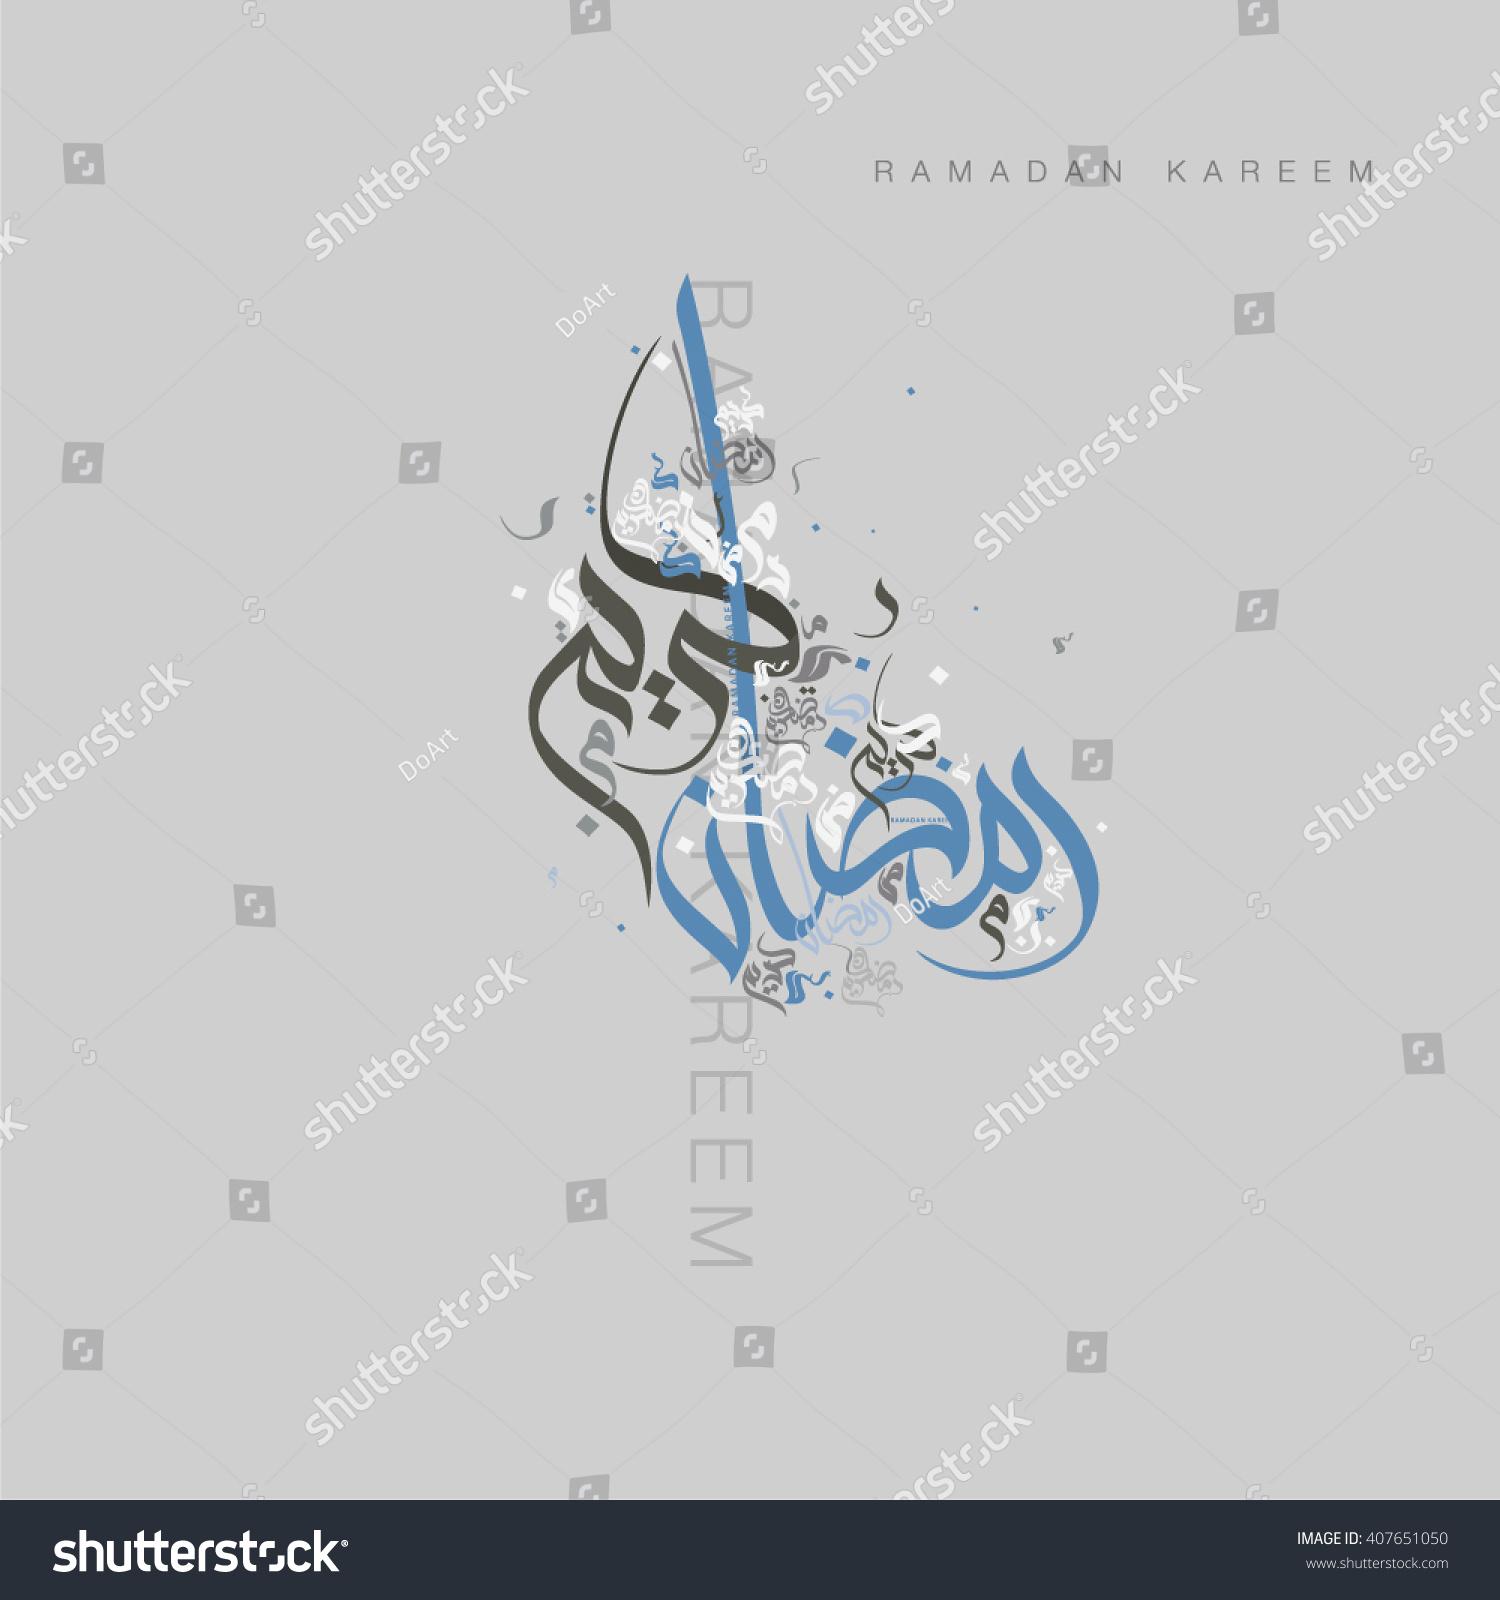 Ramadan Kareem Greeting Vector File Arabic Stock Vector Royalty